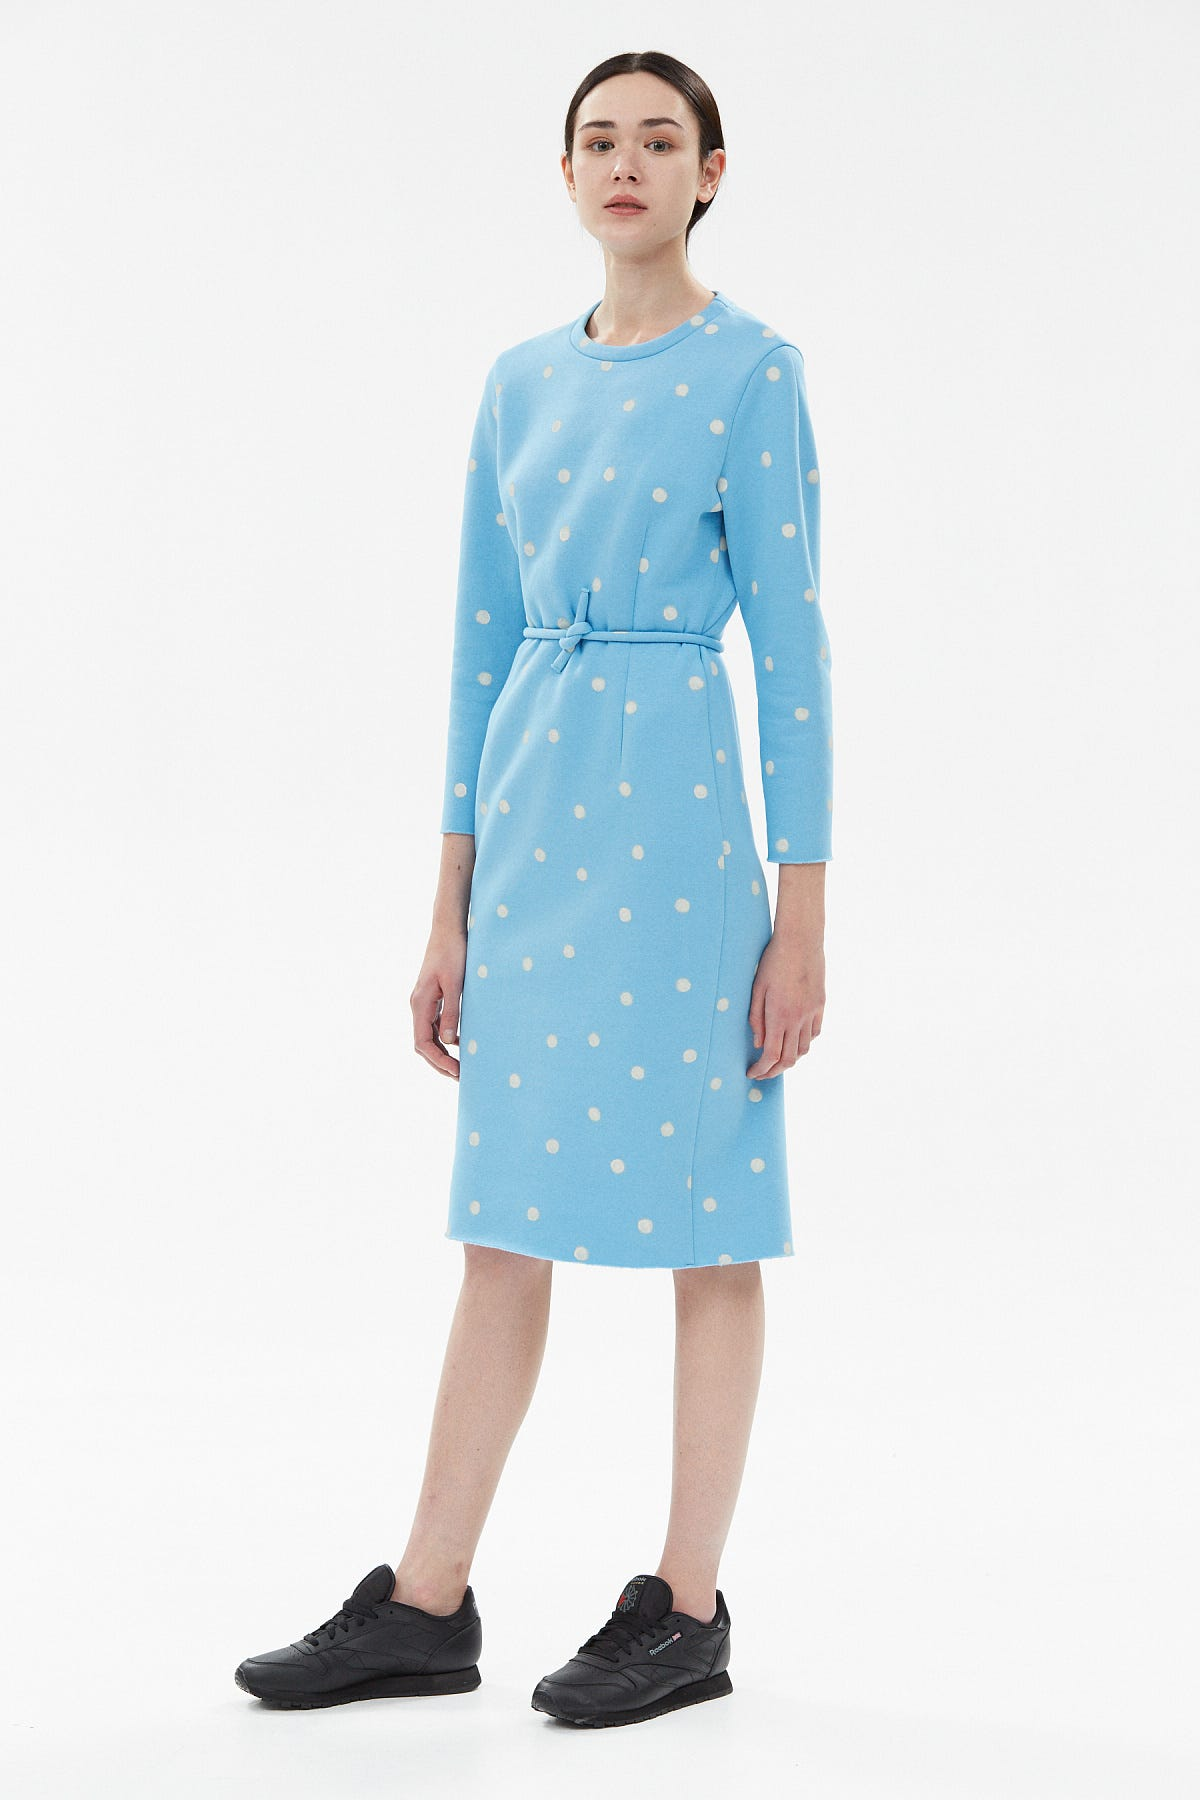 9561544bd433 Cute Ways To Wear The Polka Dot Trend Winter 2018